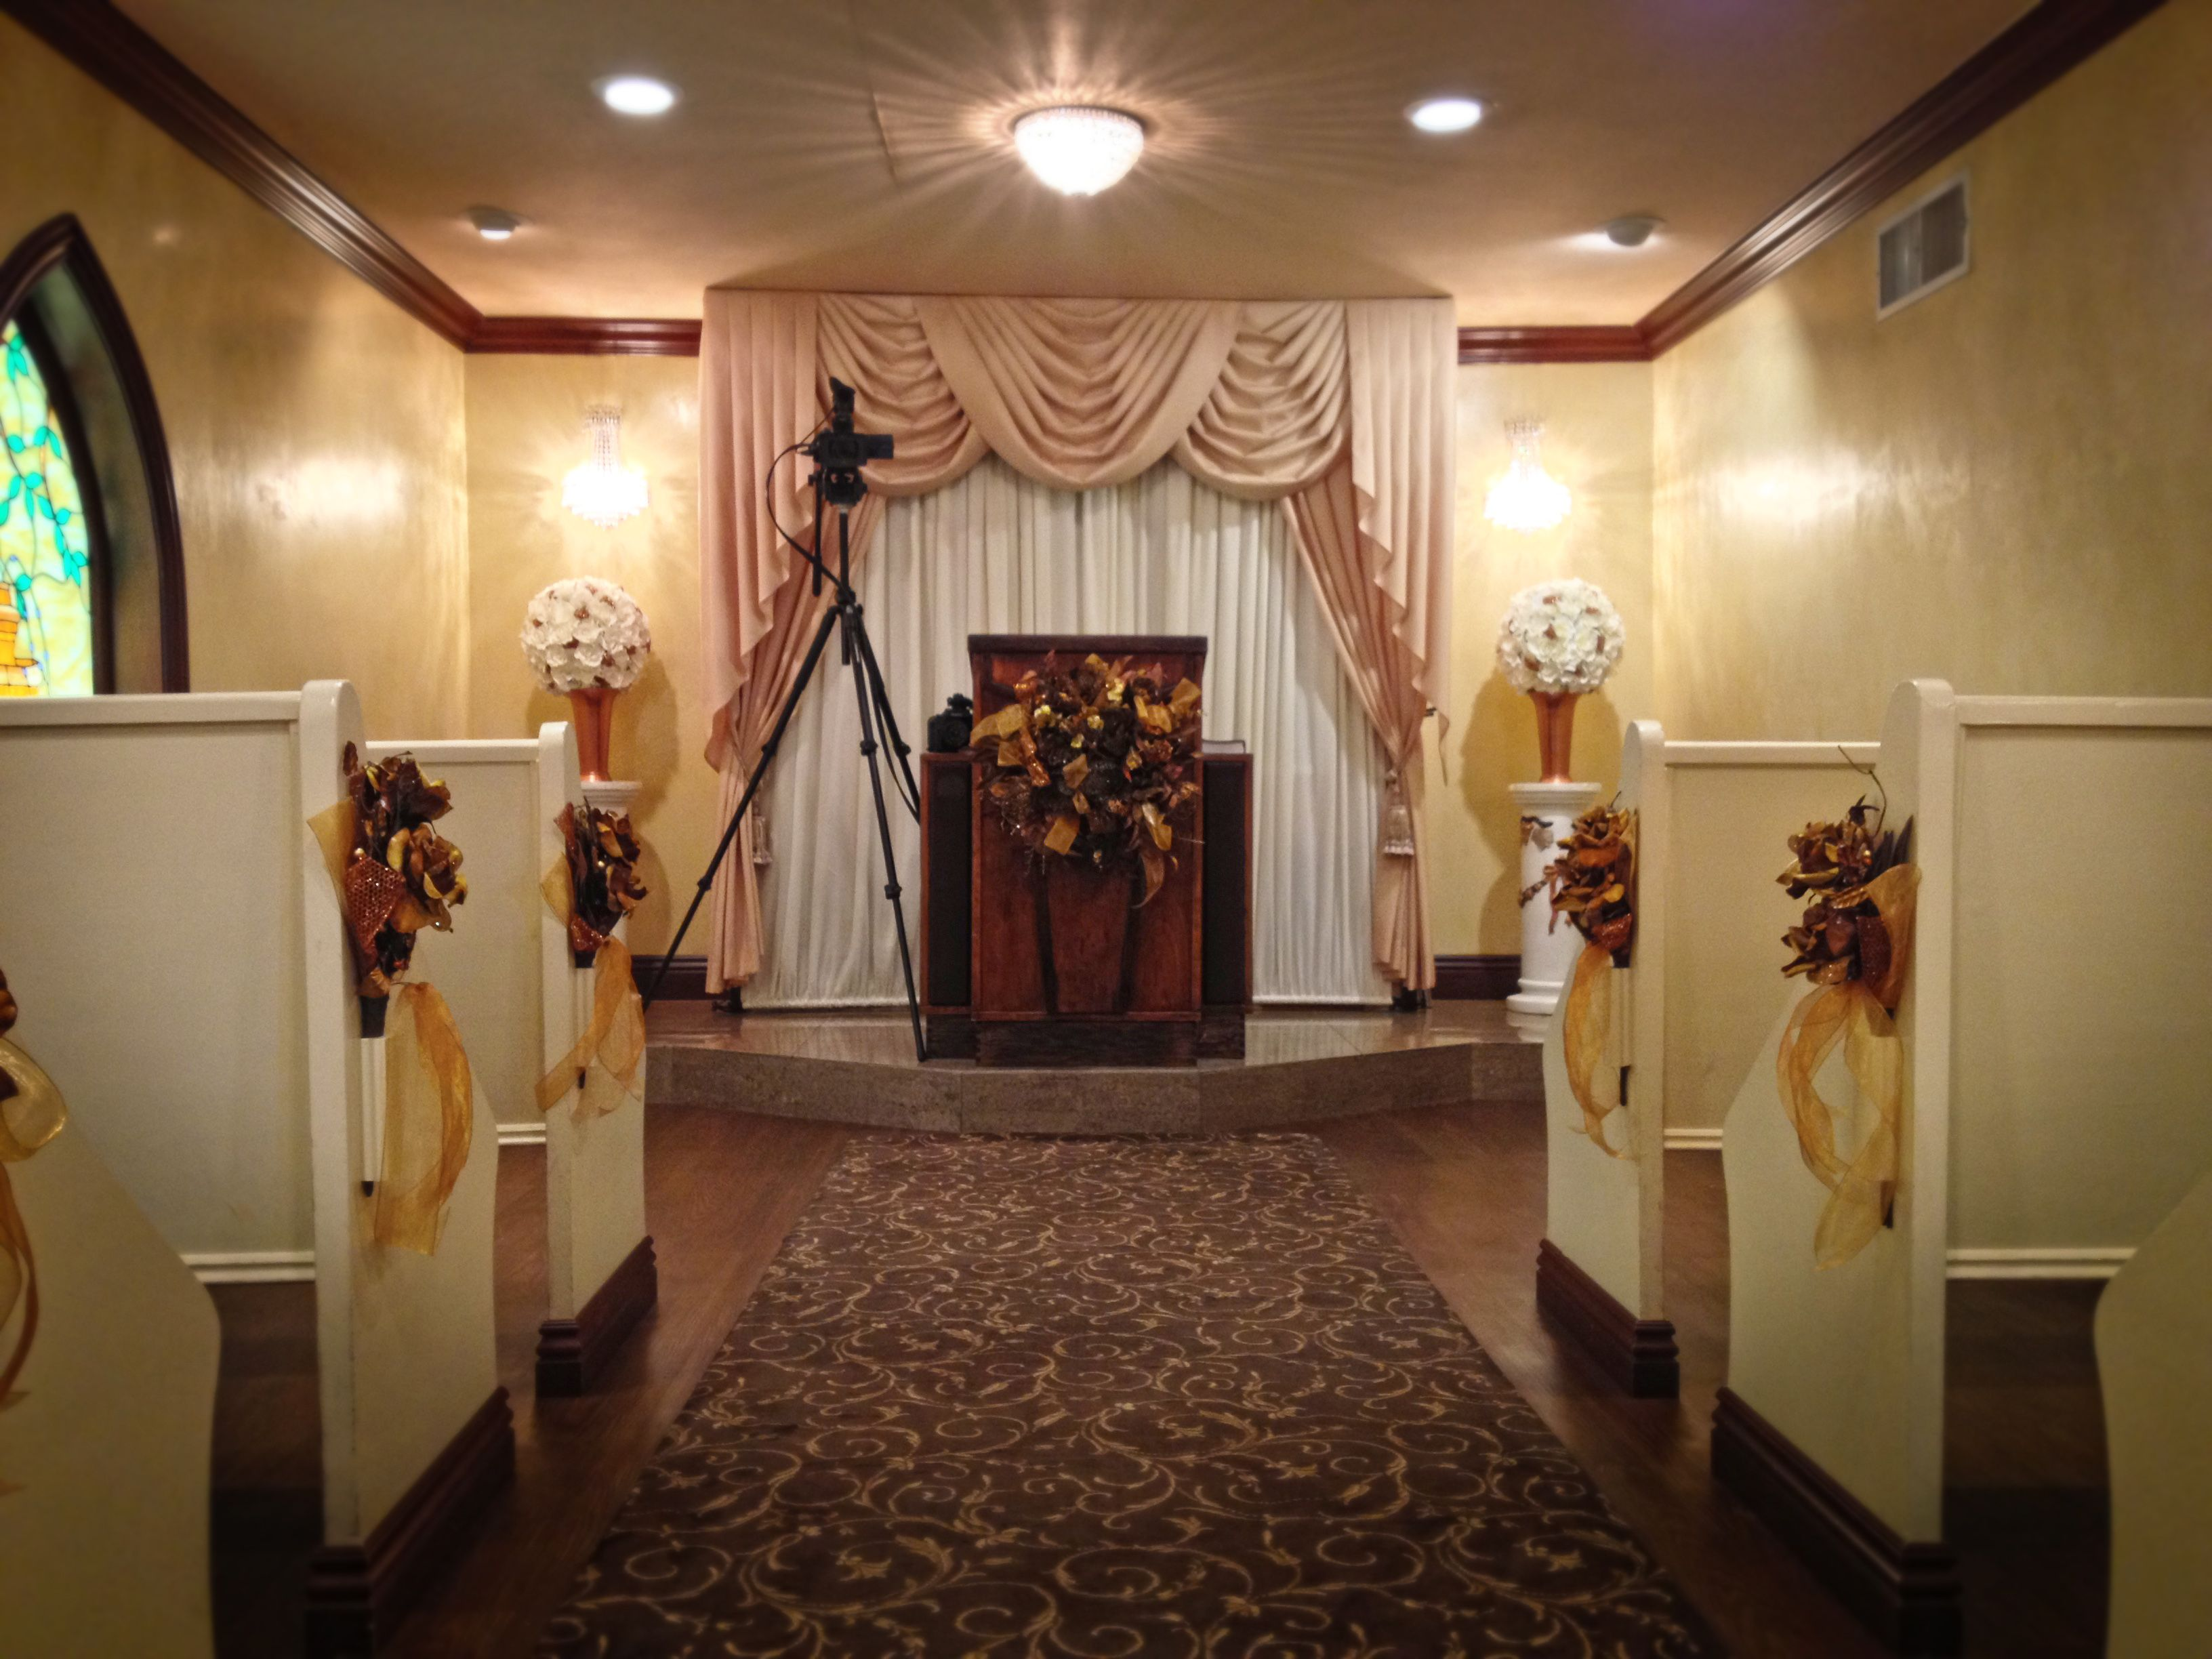 Graceland Wedding Chapel Las Vegas Nevada Click for